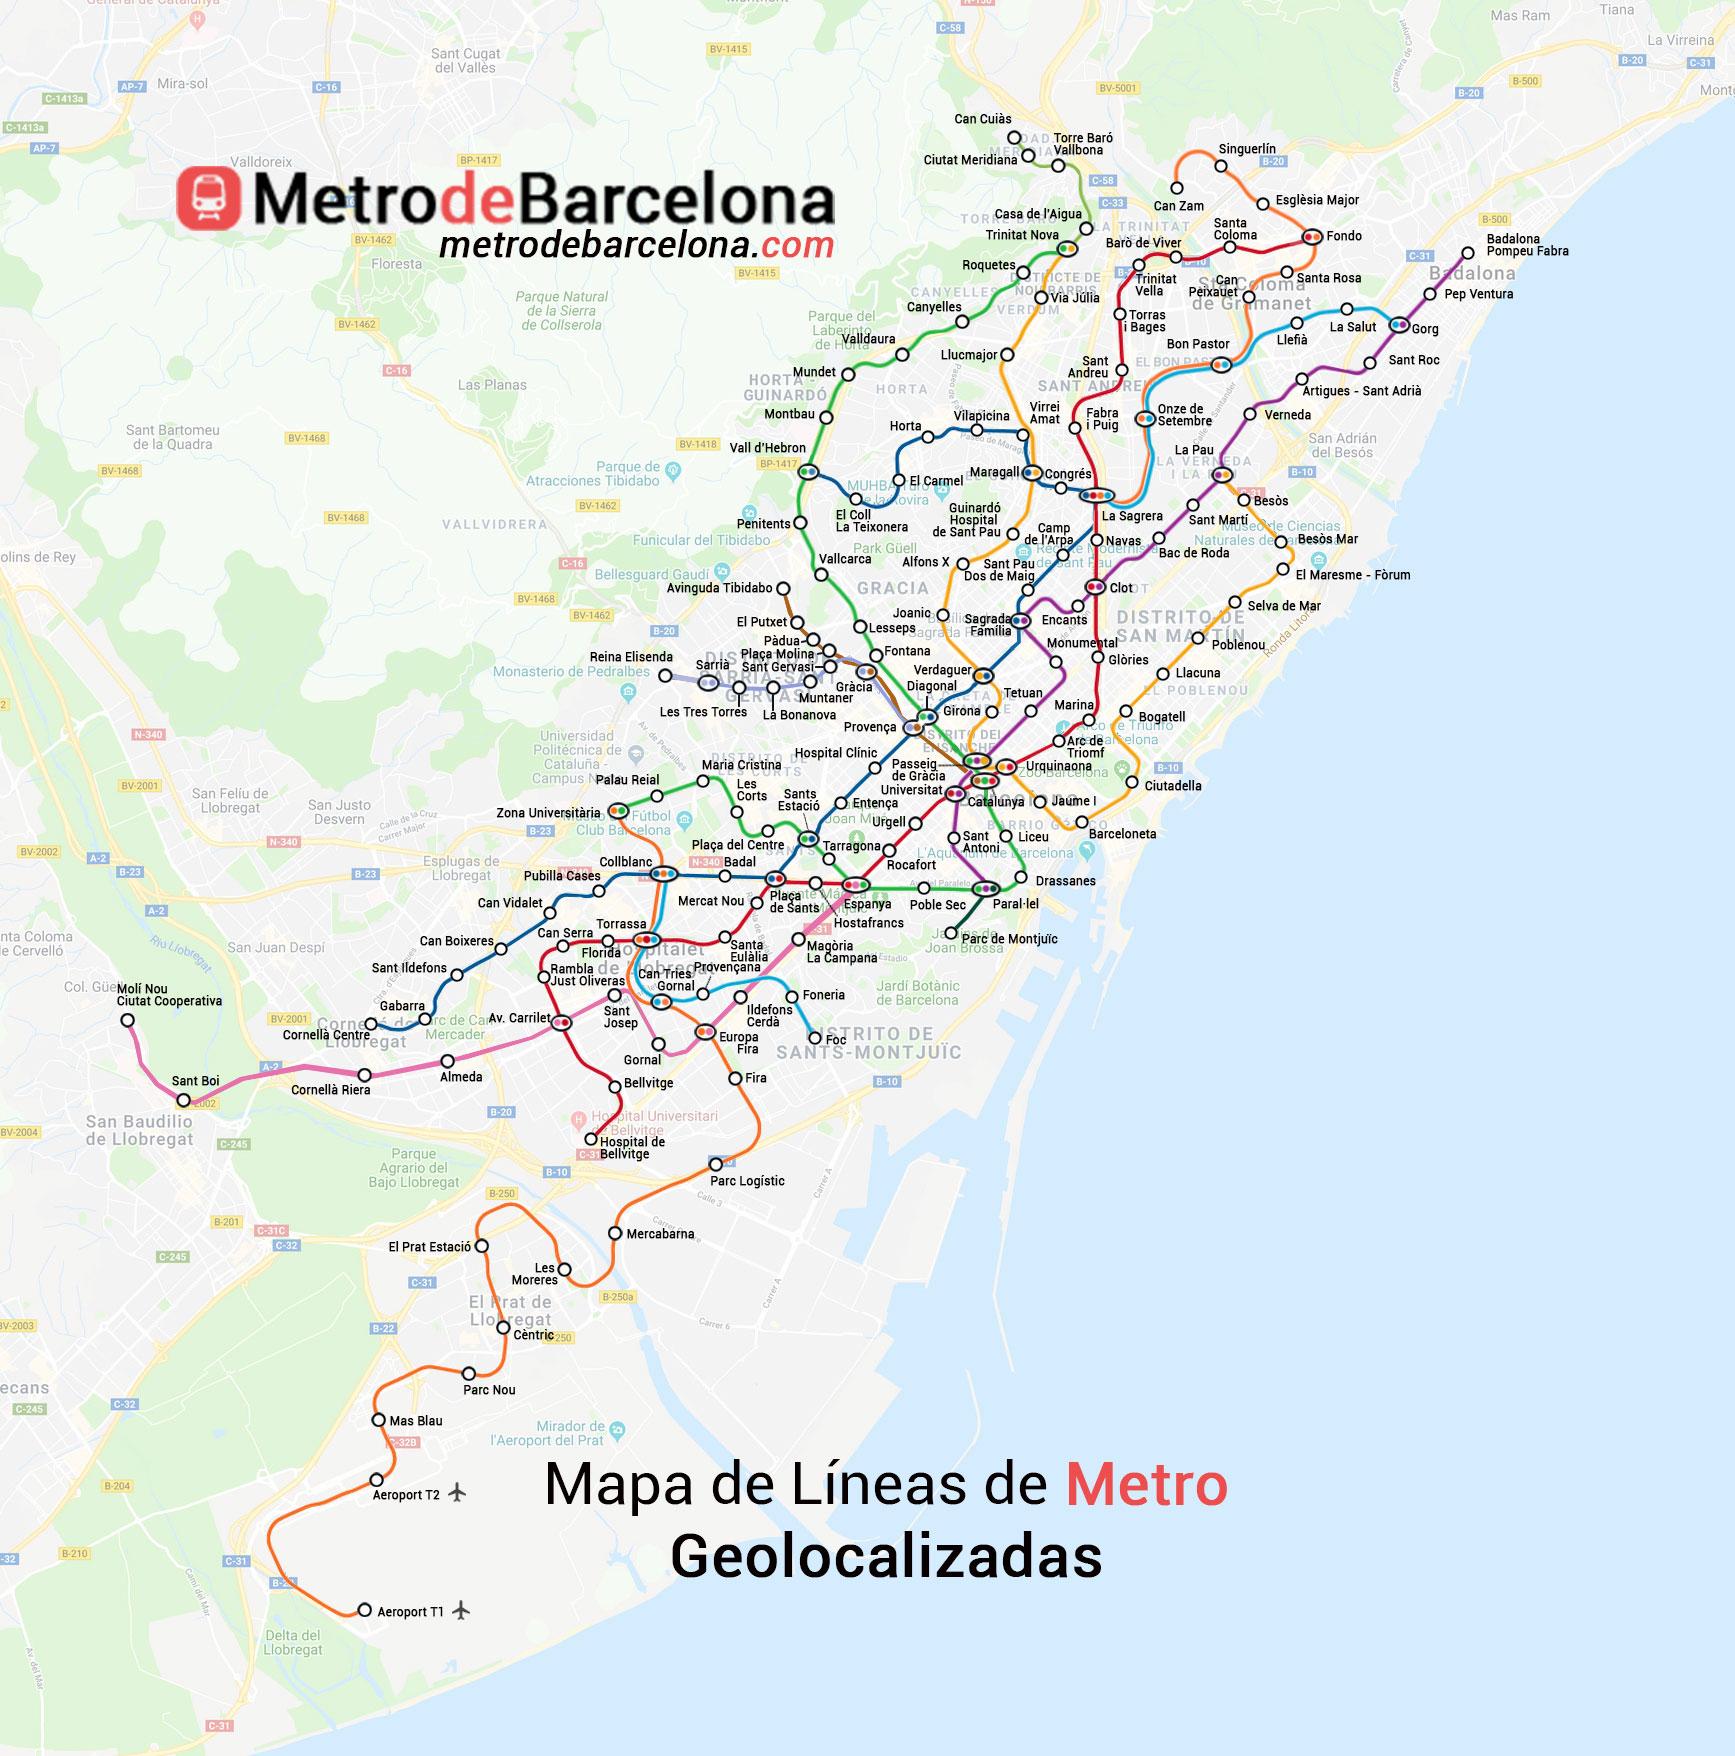 Mapa Metro Barcelona 2019.Mapas Del Metro De Barcelona 2019 Metrodebarcelona Com